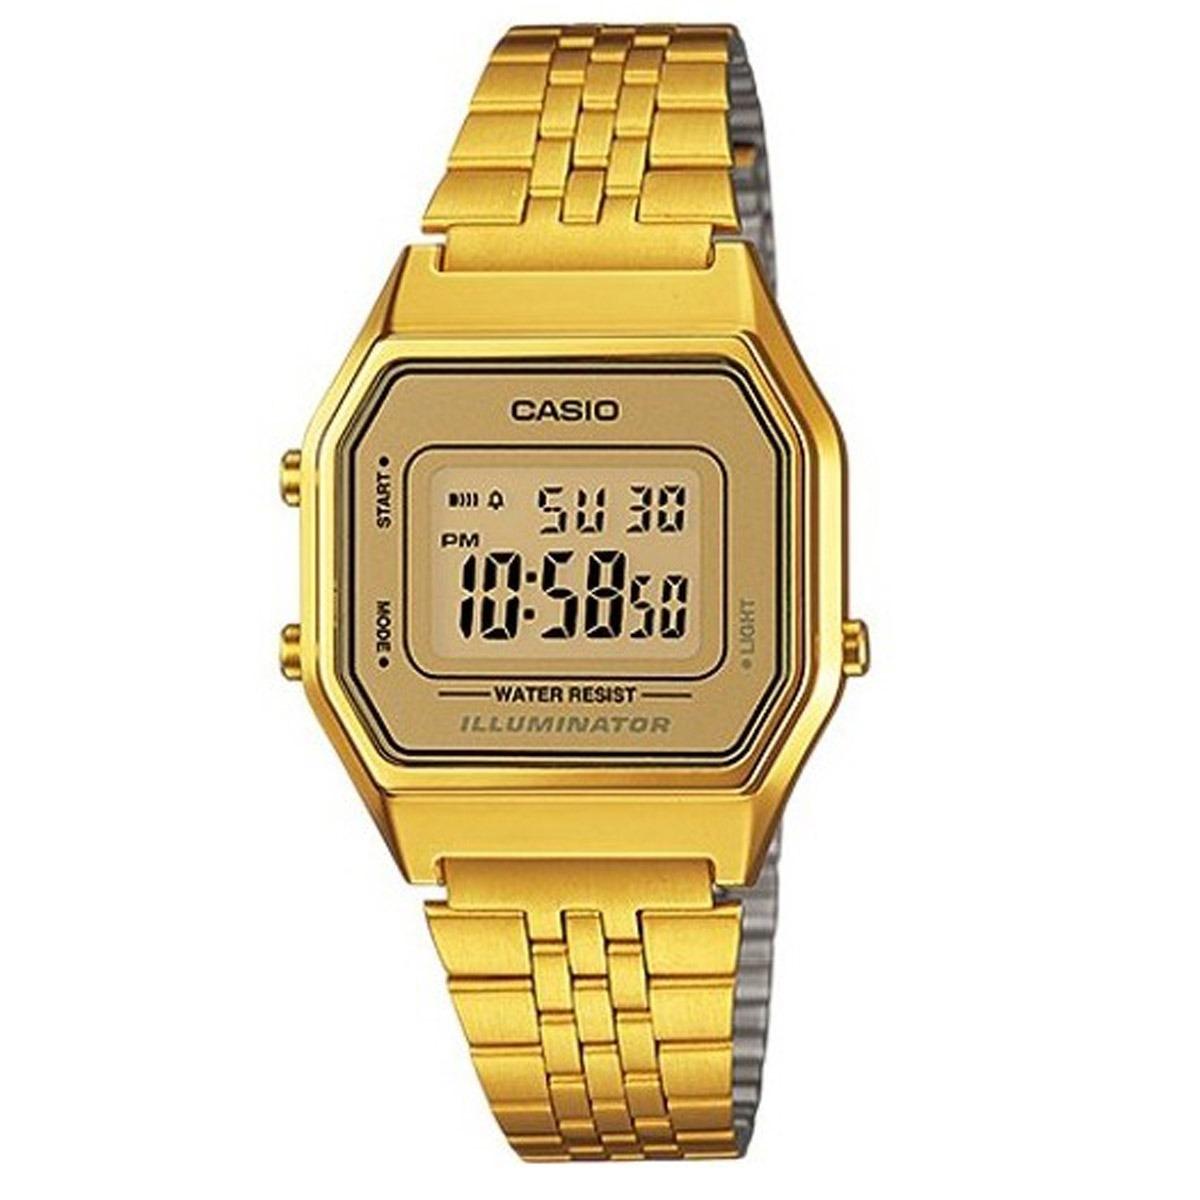 9059f9ee3b8 Relógio Casio Vintage Digital Unissex La680wga-9df - R  309